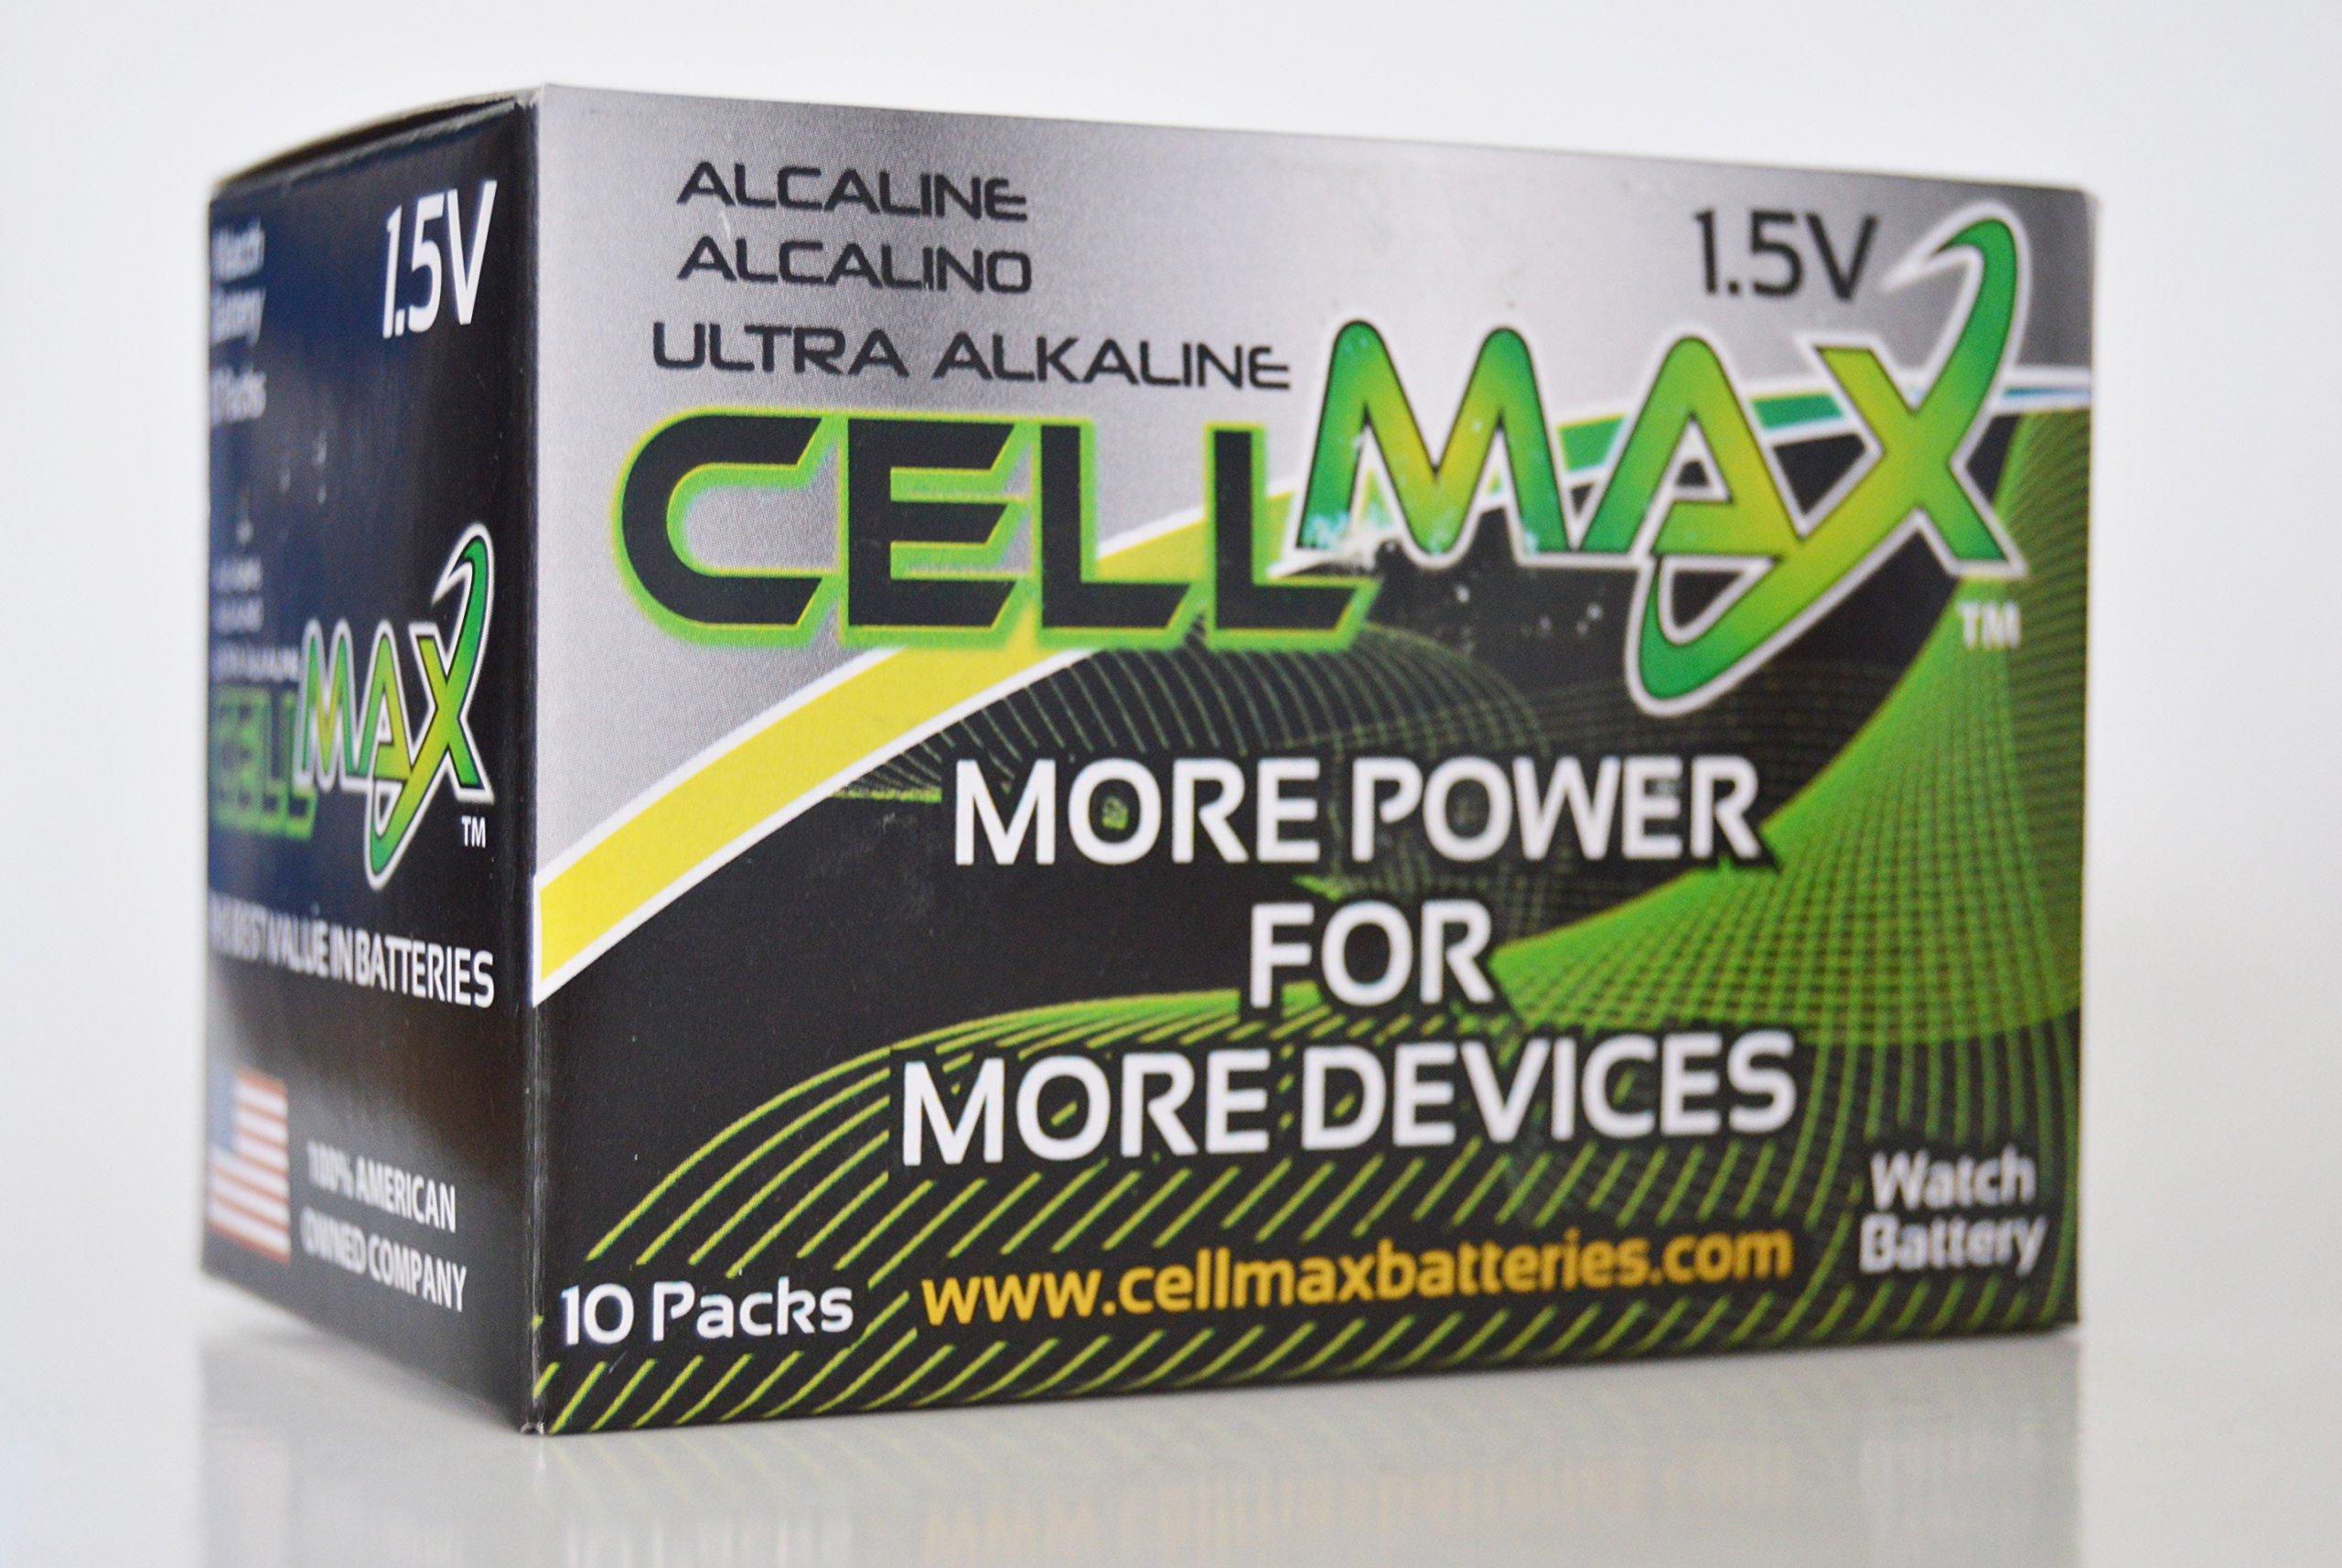 CellMax CM-AG5-BP3 - (30) Alkaline Button AG5 Batteries (10, 3-Packs) by CellMax (Image #4)